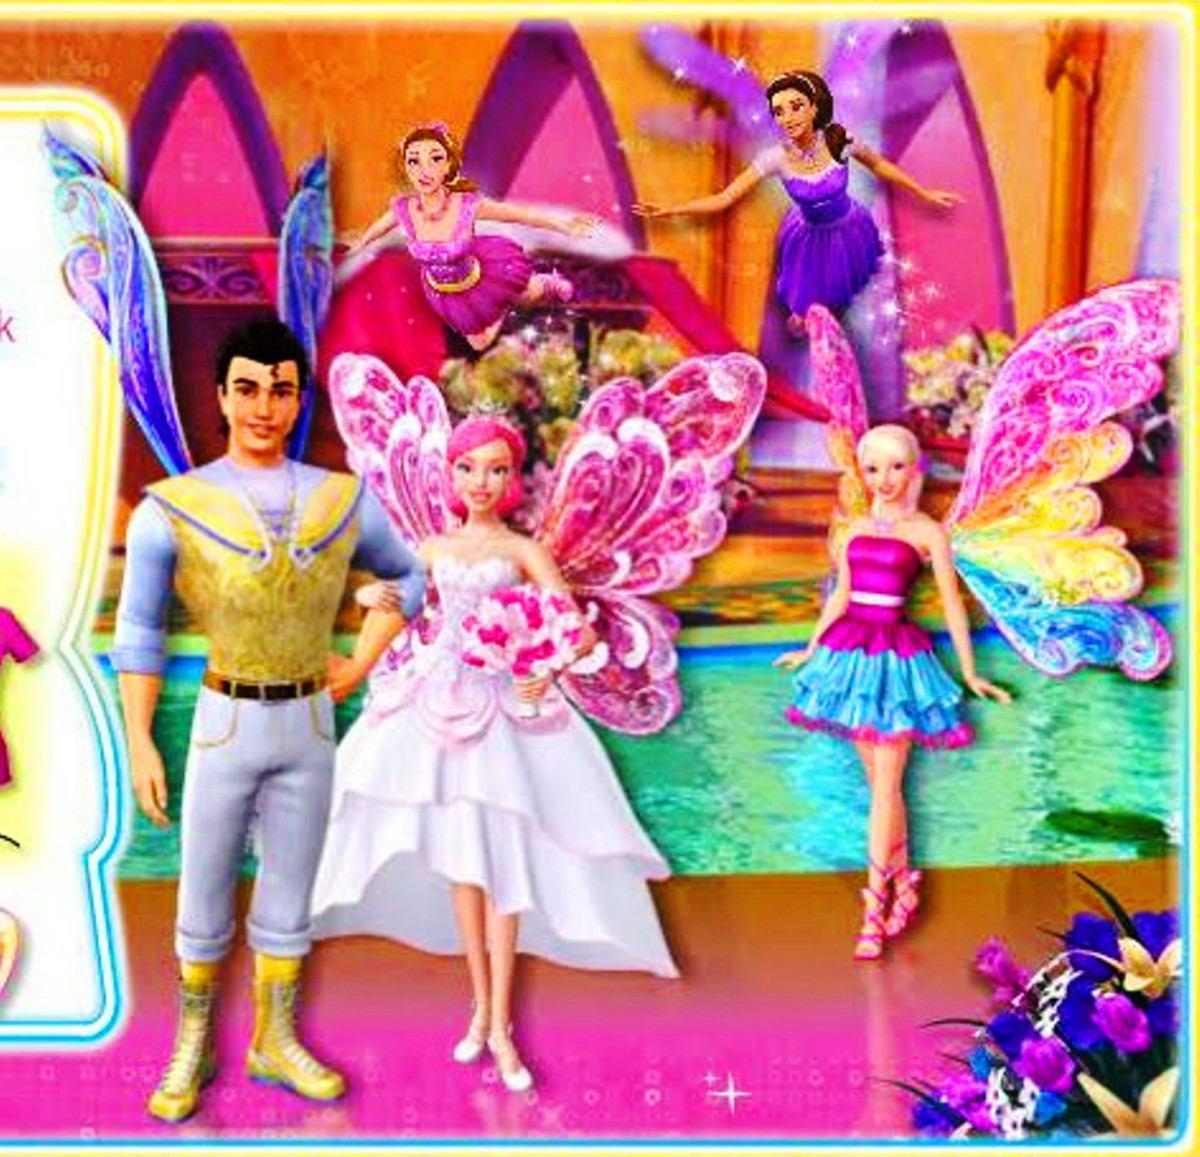 Prsentation barbie el secreto de las hada lengua michell c personajes thecheapjerseys Choice Image